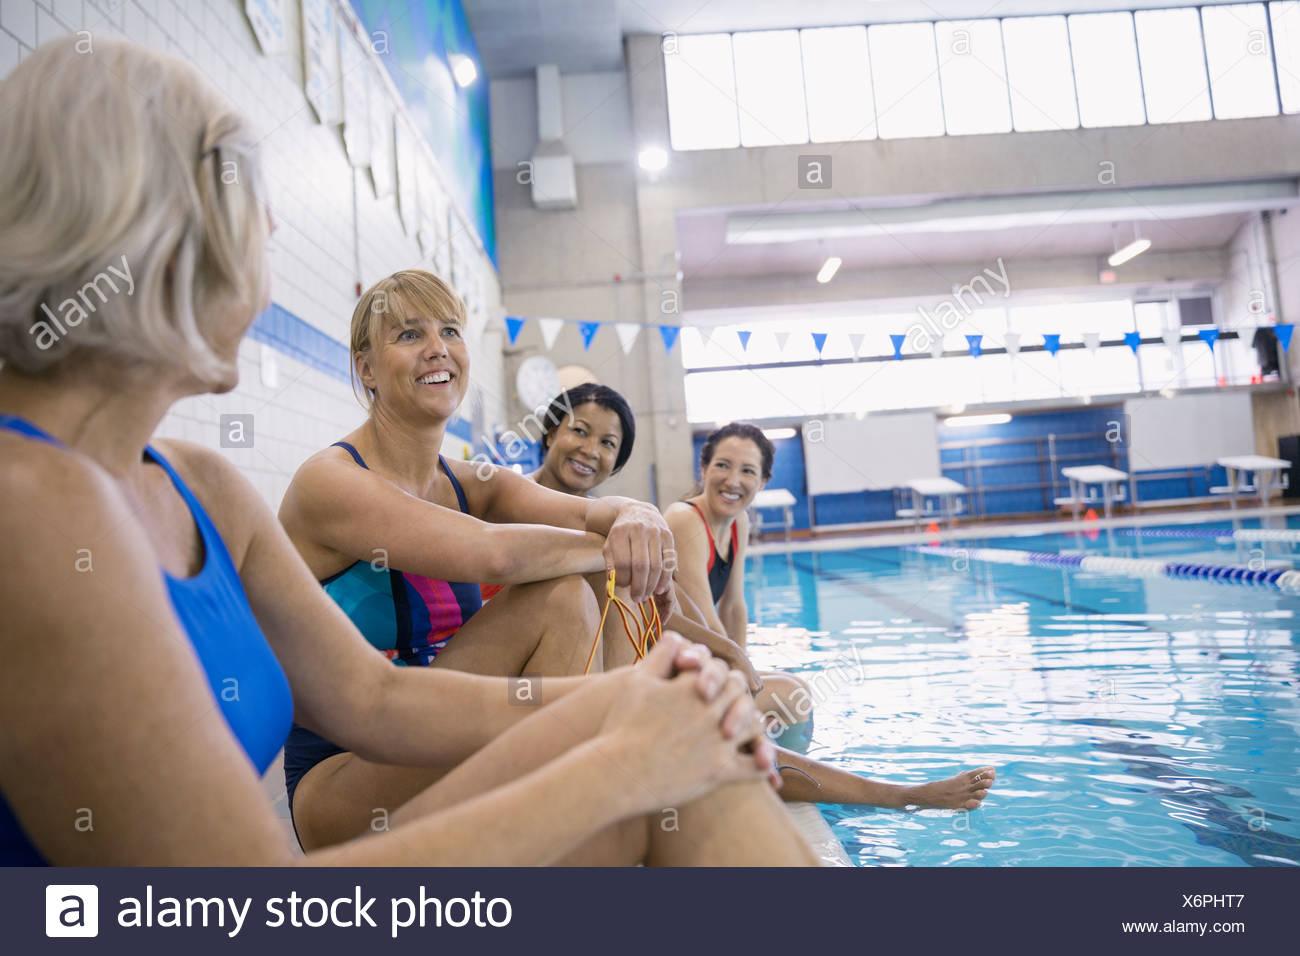 Women talking at indoor swimming pool - Stock Image